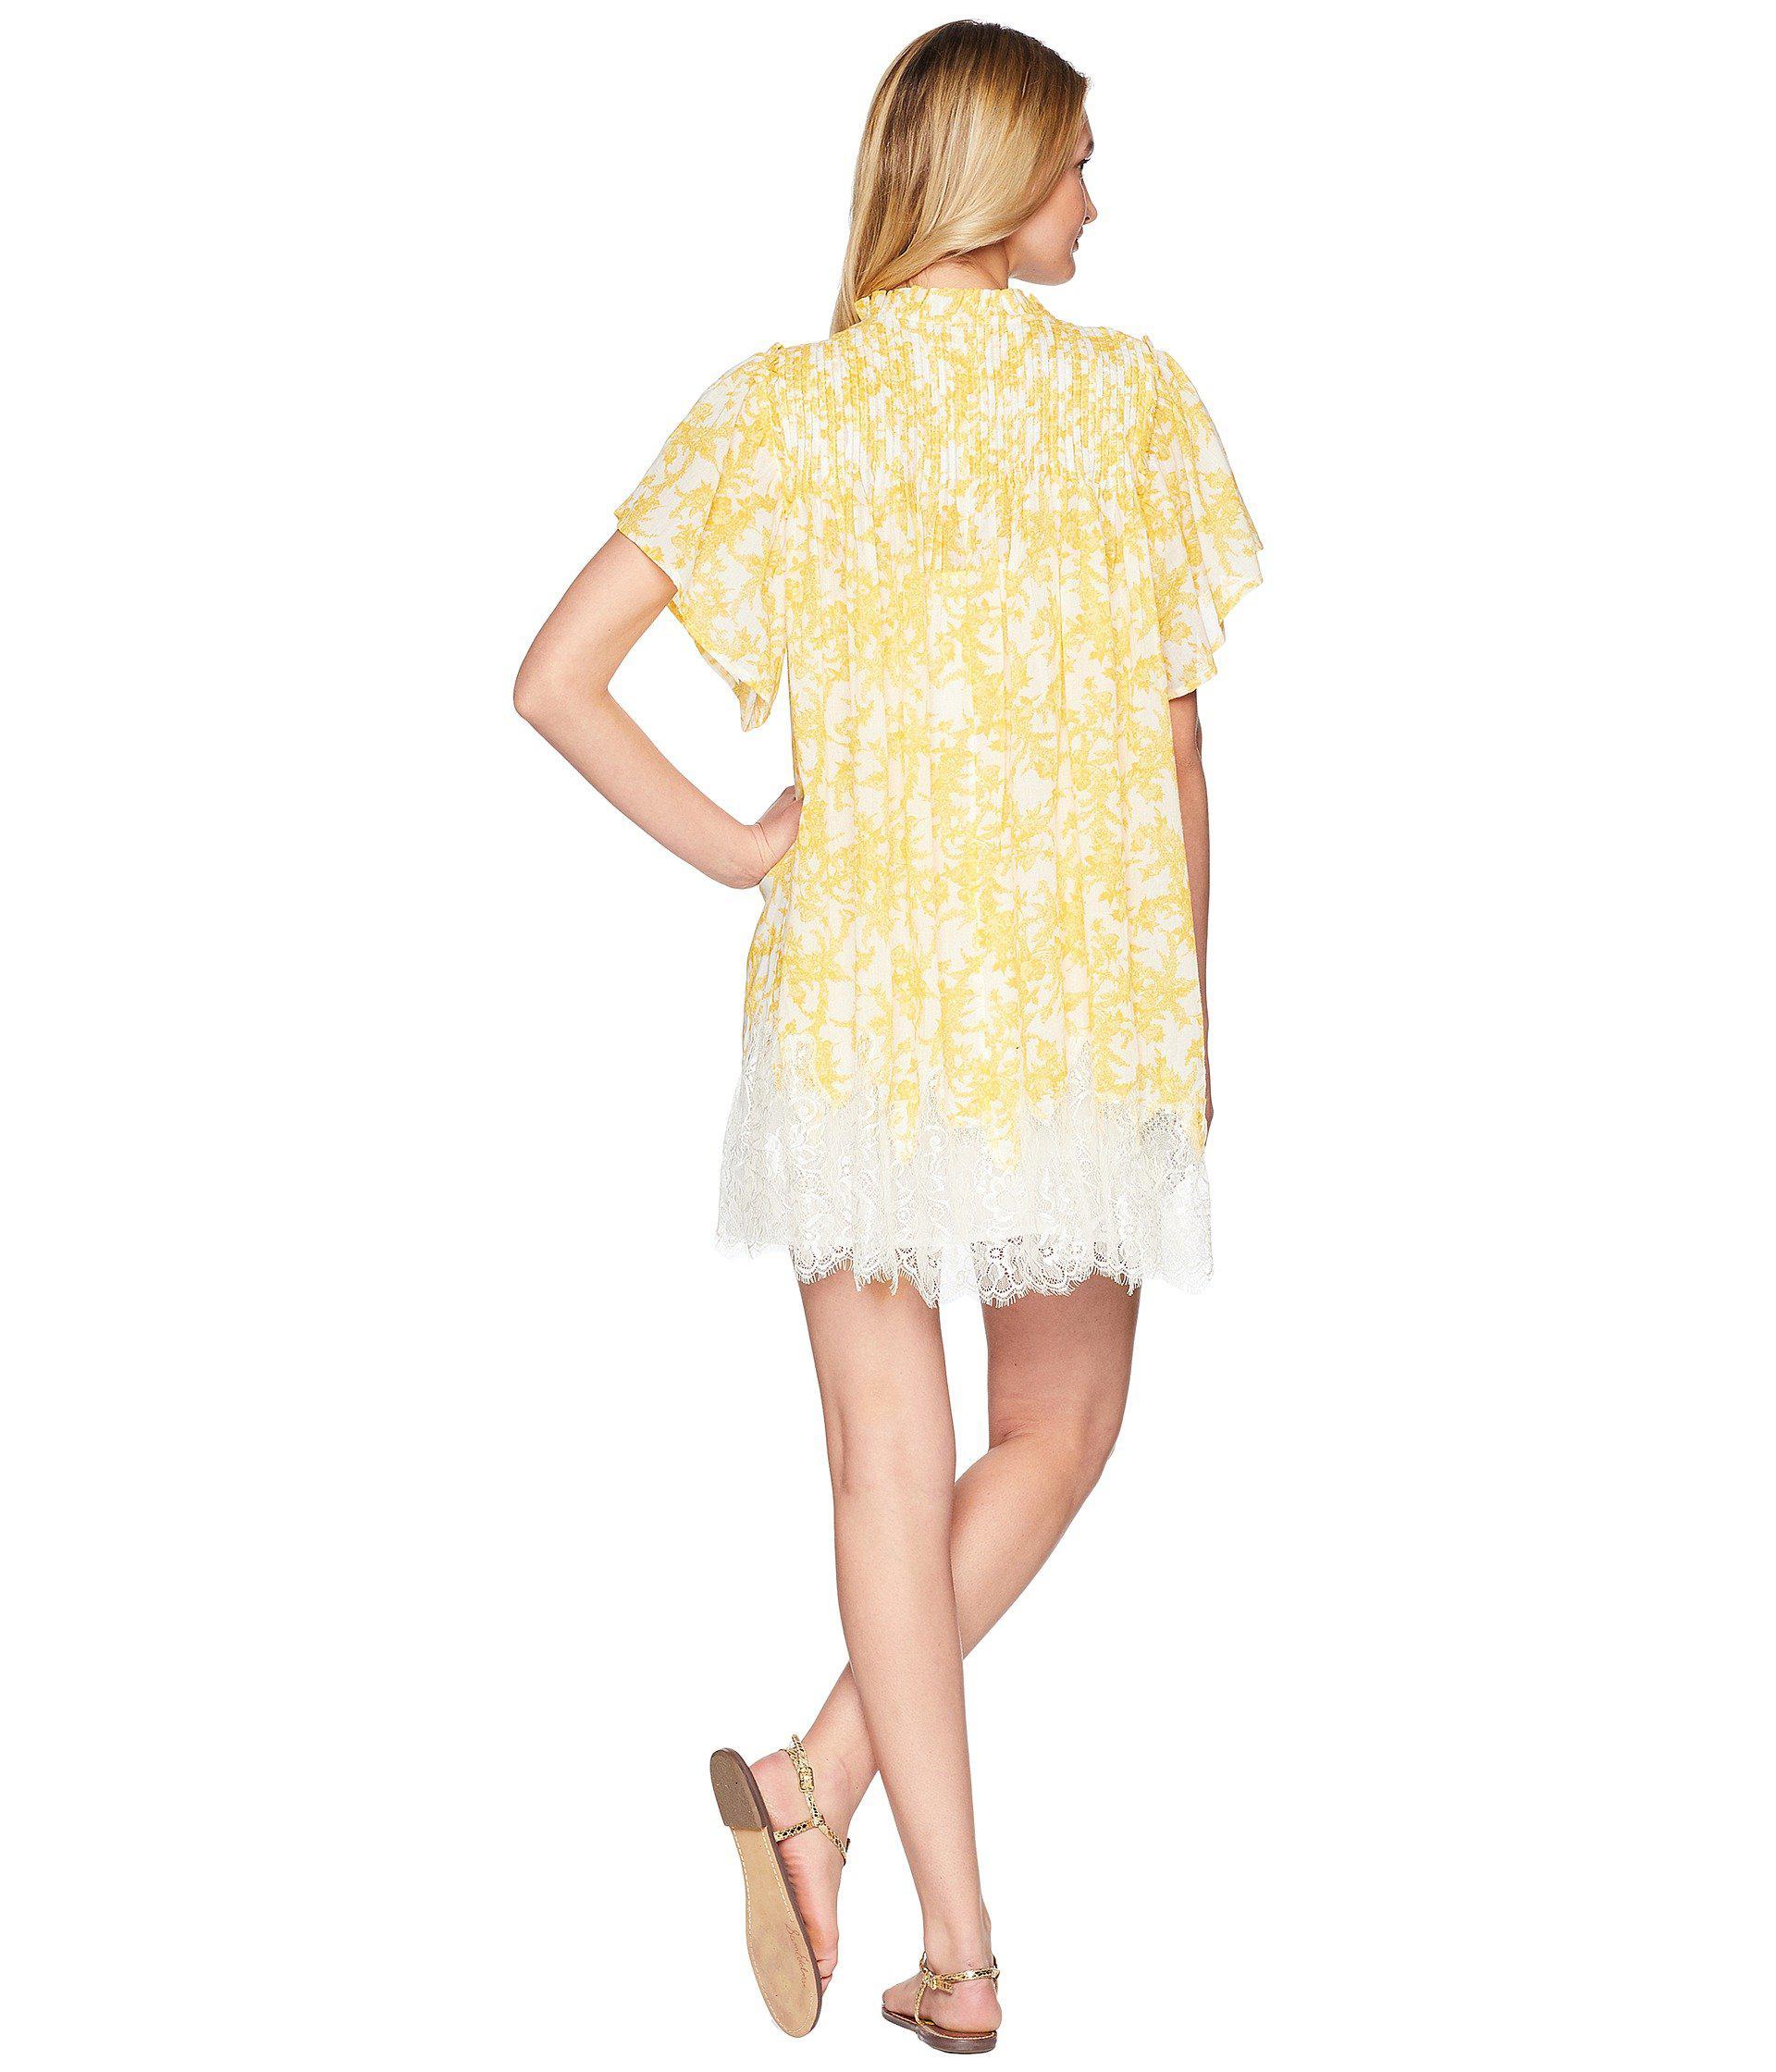 a26759e97172 Free People - White Marigold Mini Dress - Lyst. View fullscreen